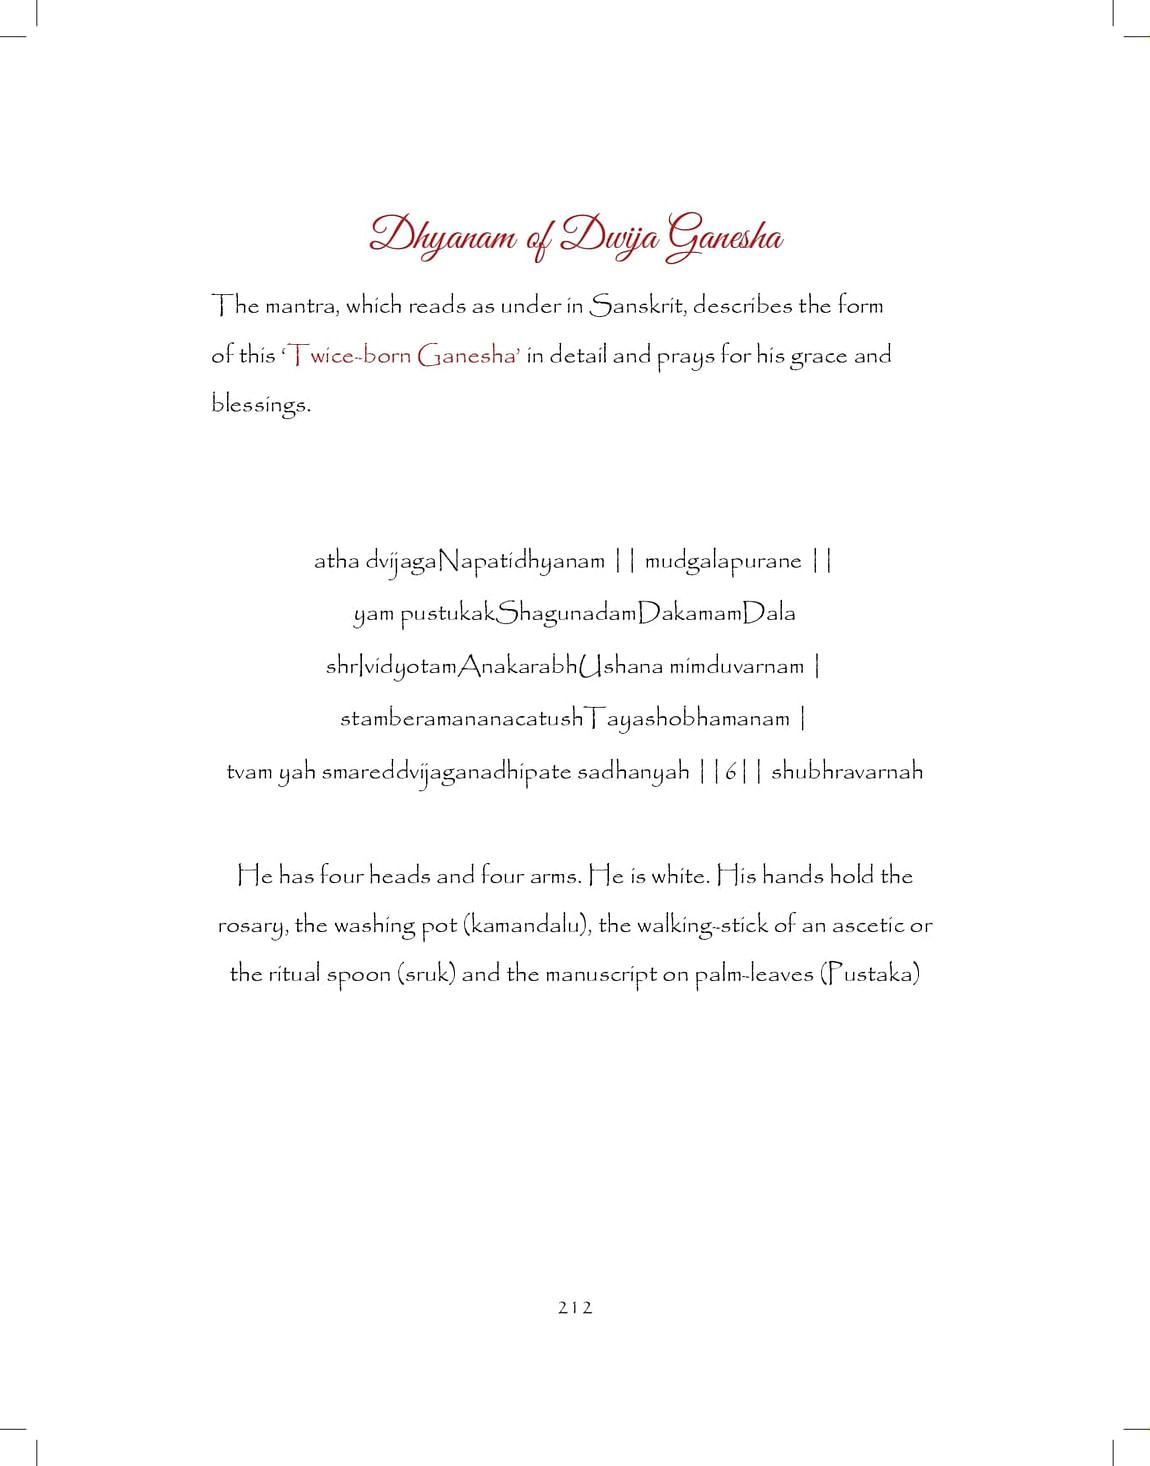 Ganesh-print_pages-to-jpg-0212.jpg